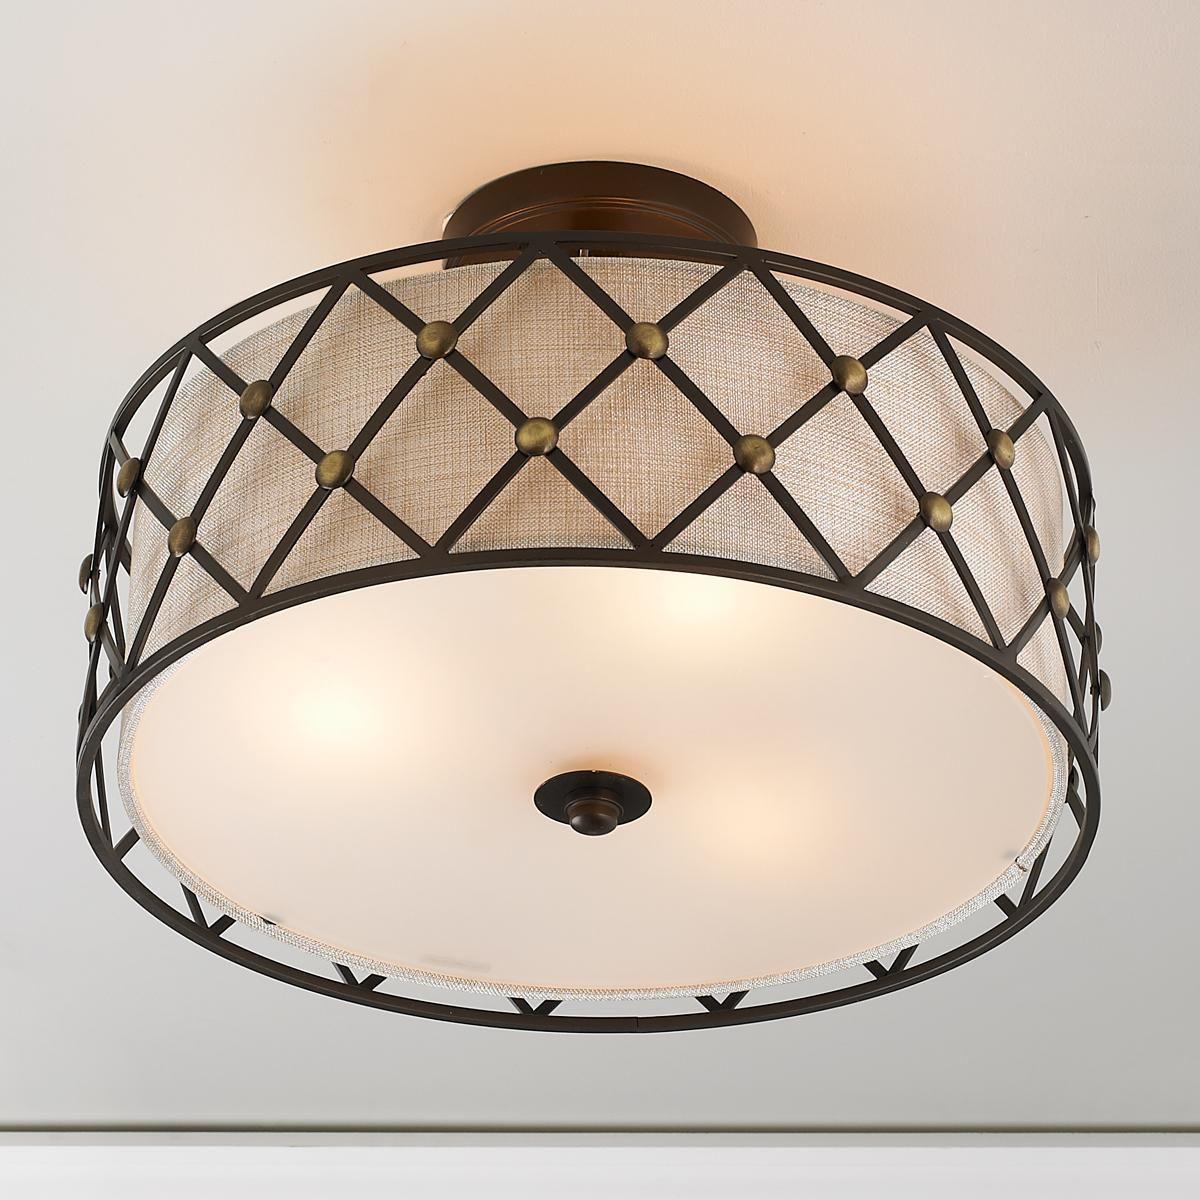 Modern Studded Lattice Ceiling Light Ceiling Lights Bedroom Ceiling Light Ceiling Light Shades